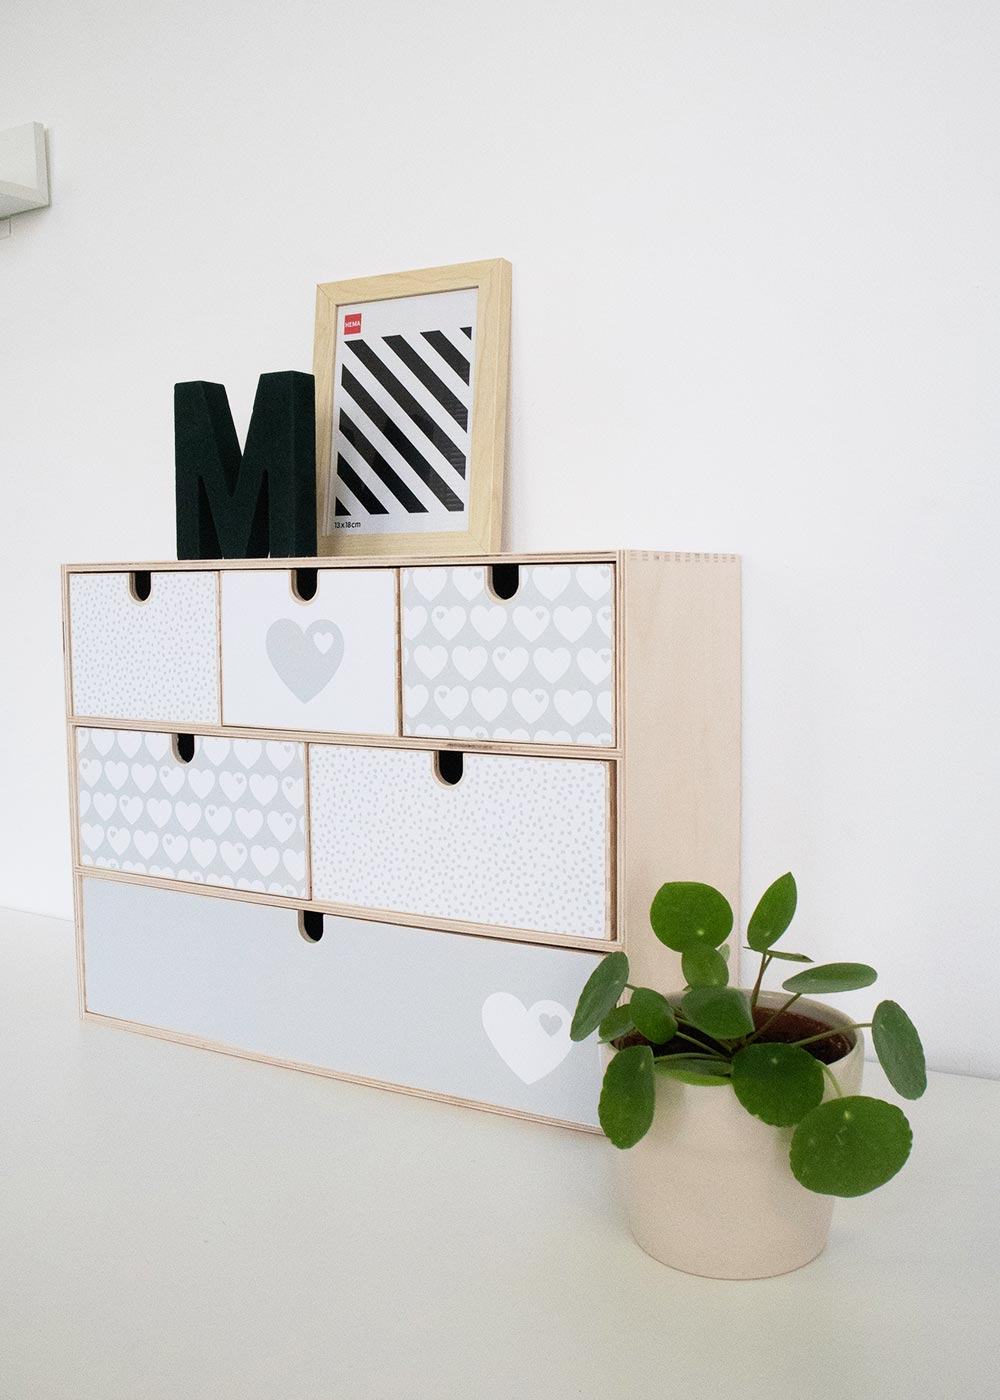 Klebefolie Ikea Moppe ByGraziela grau Herz Seitenansicht